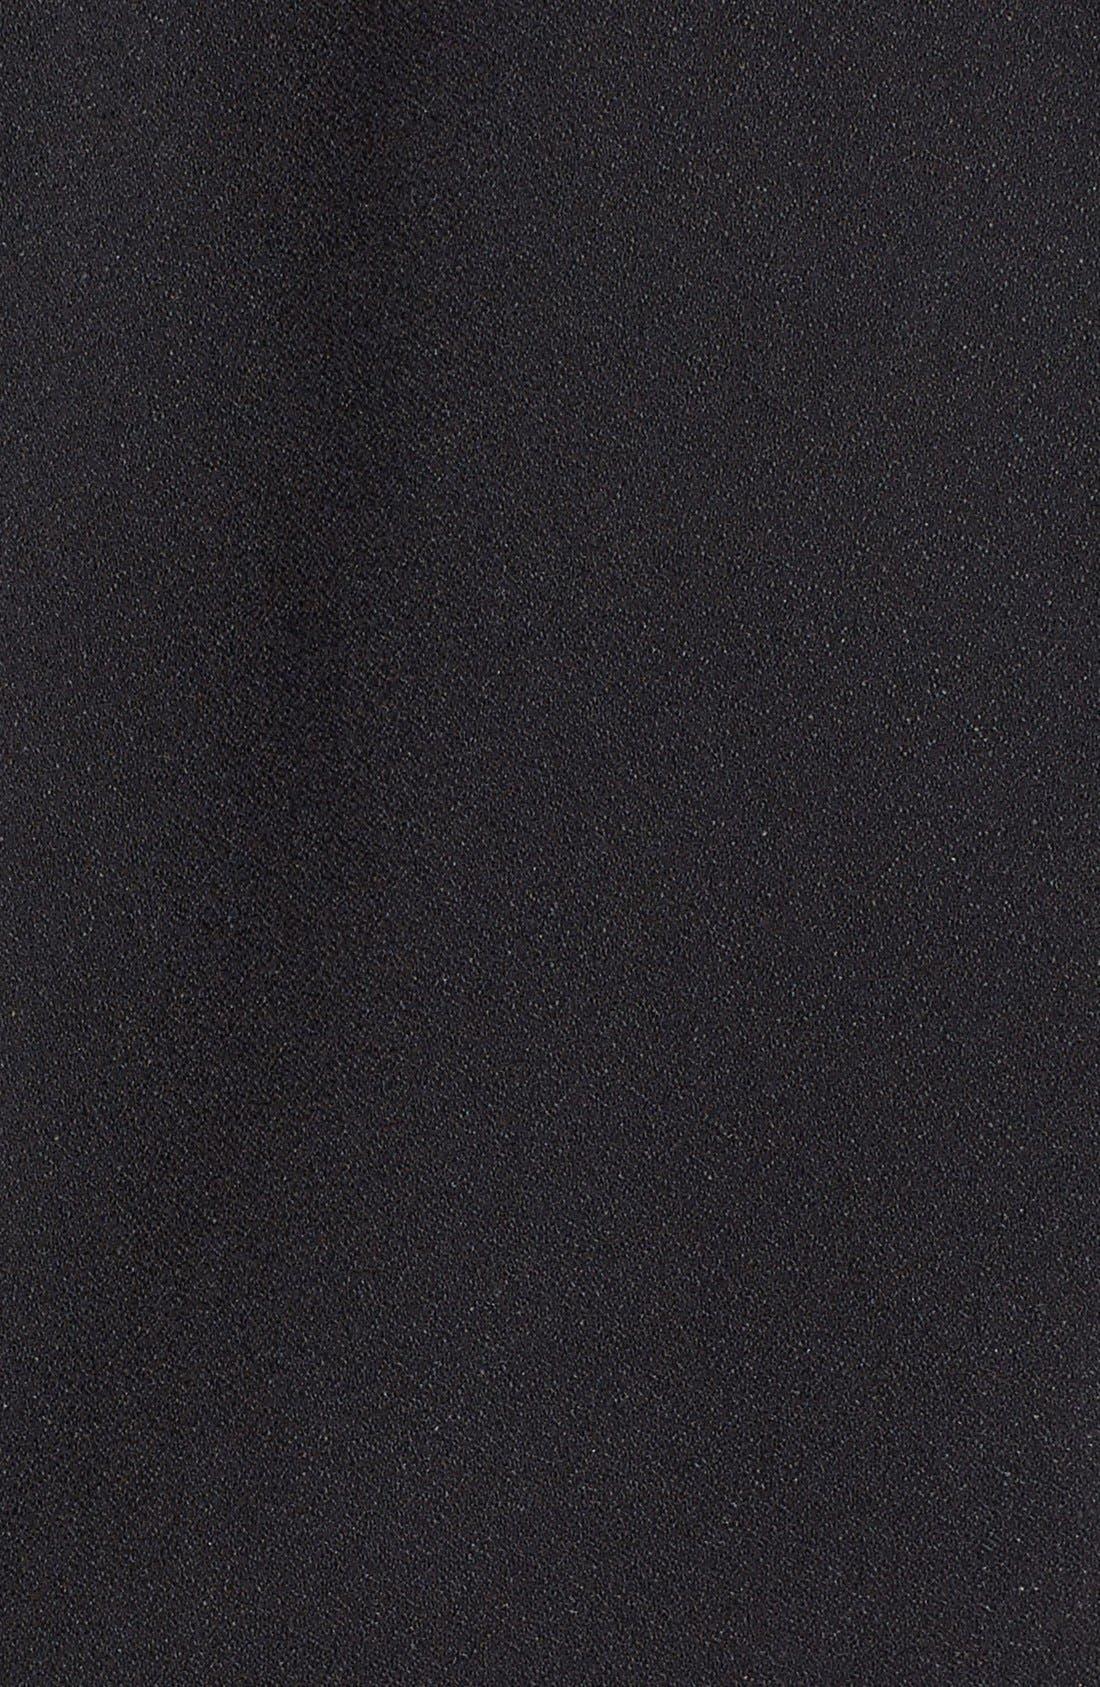 Alternate Image 3  - Dolce&Gabbana Rose Print Cady Top